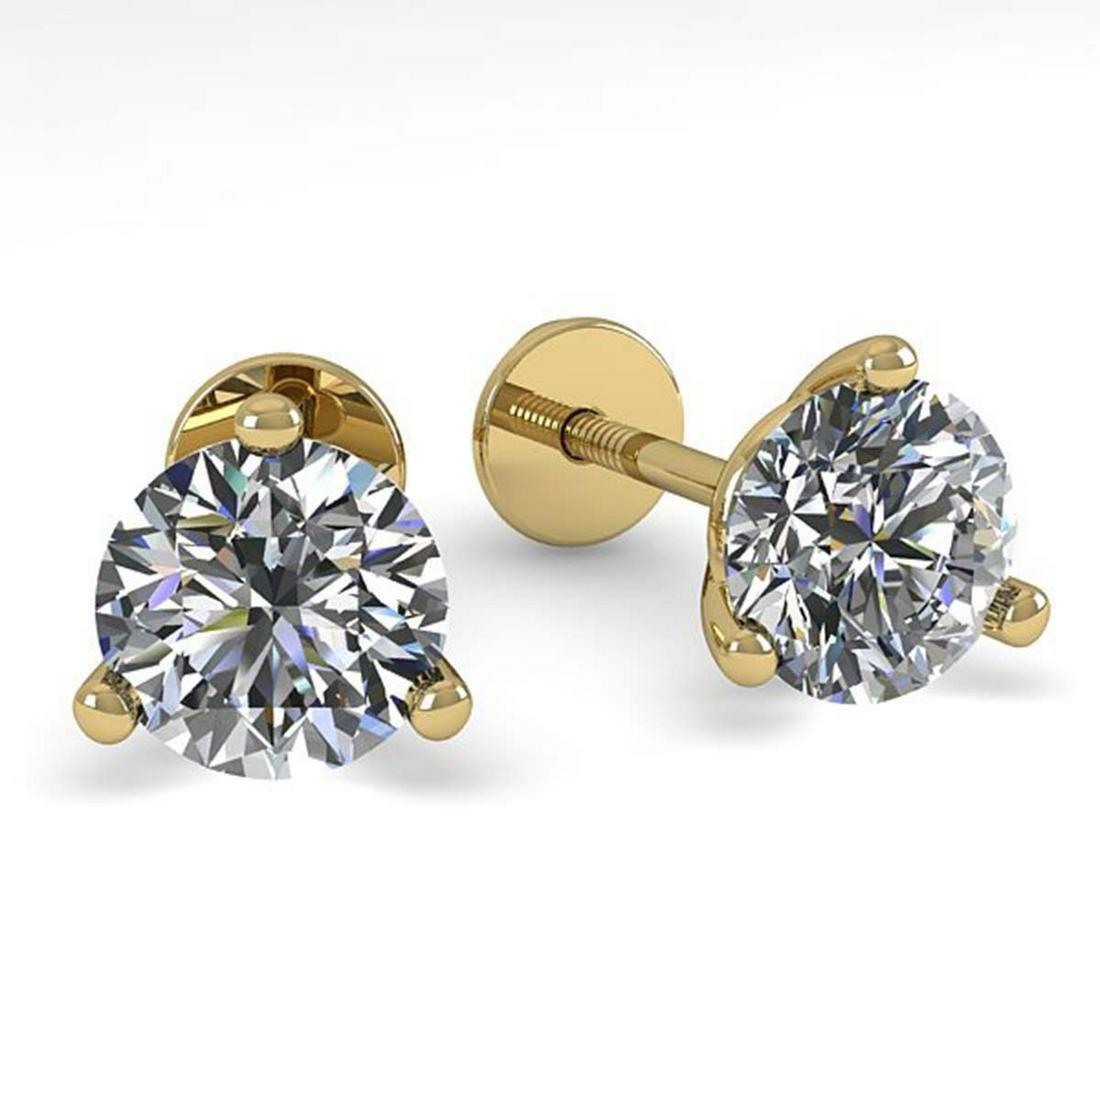 0.52 ctw VS/SI Diamond Stud Earrings 14K Yellow Gold -